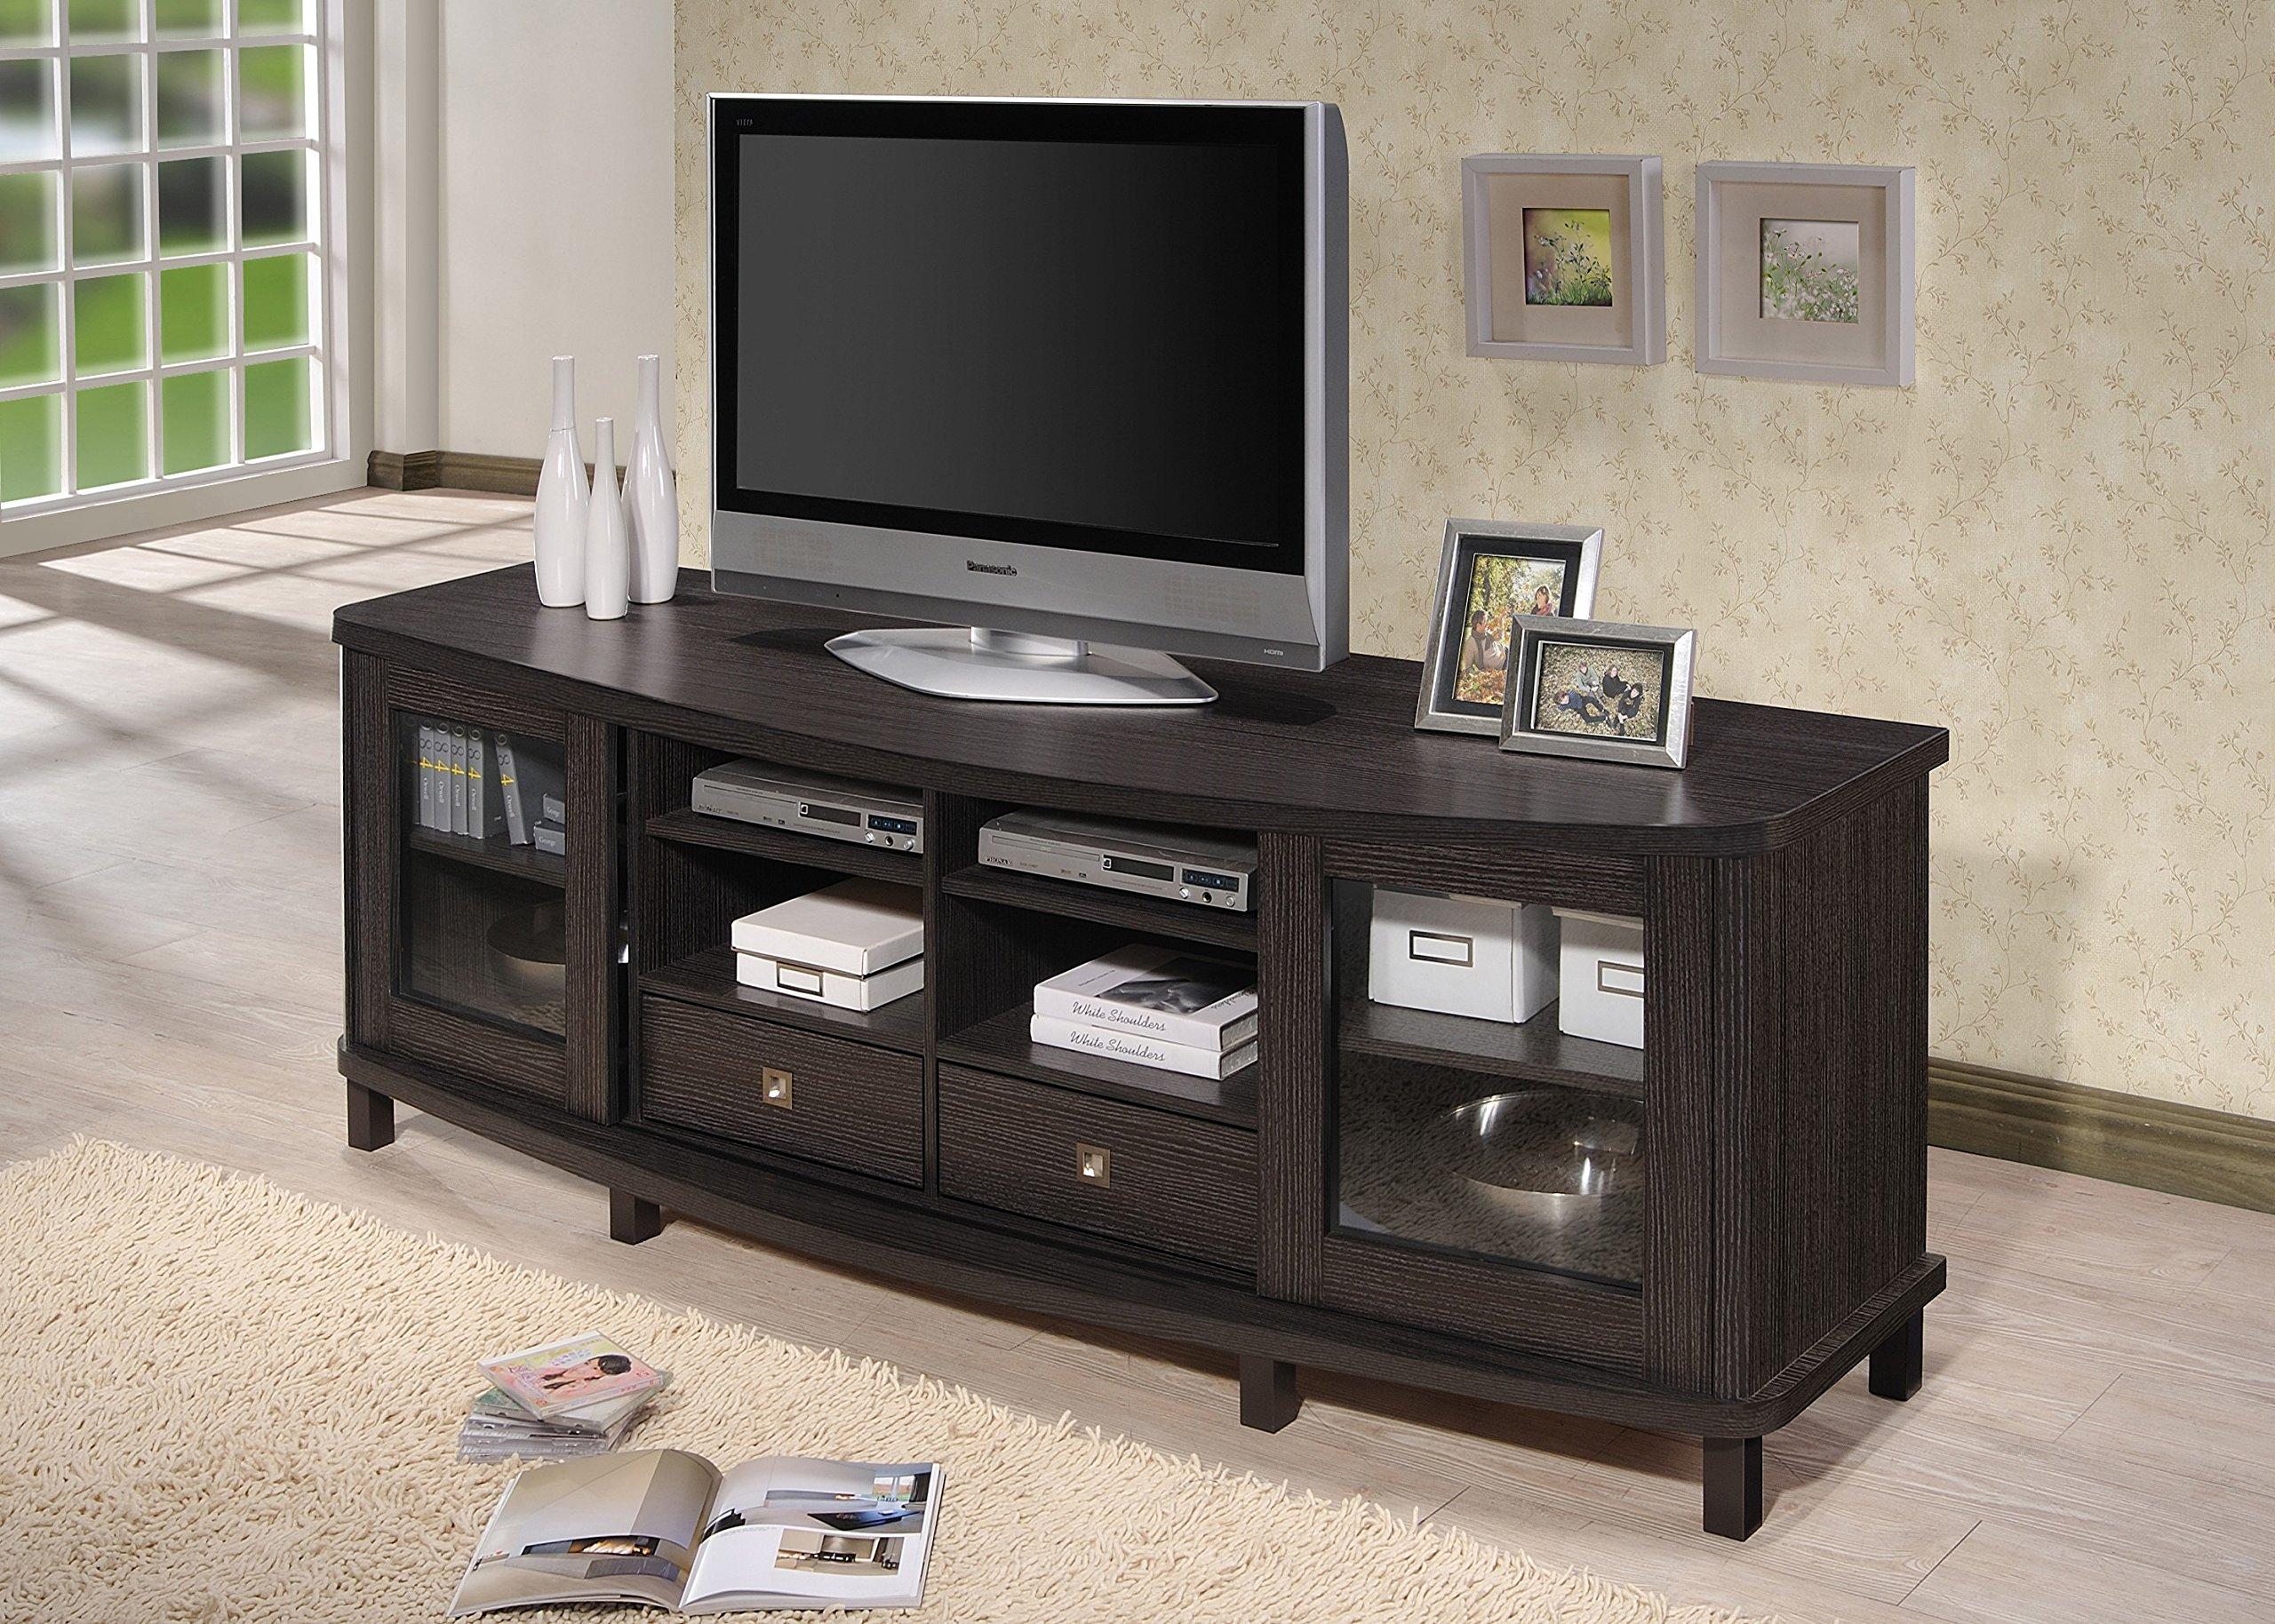 Wholesale Interiors Baxton Studio Walda Wood TV Cabinet with 2 Sliding Doors and 2 Drawers, 70'', Dark Brown